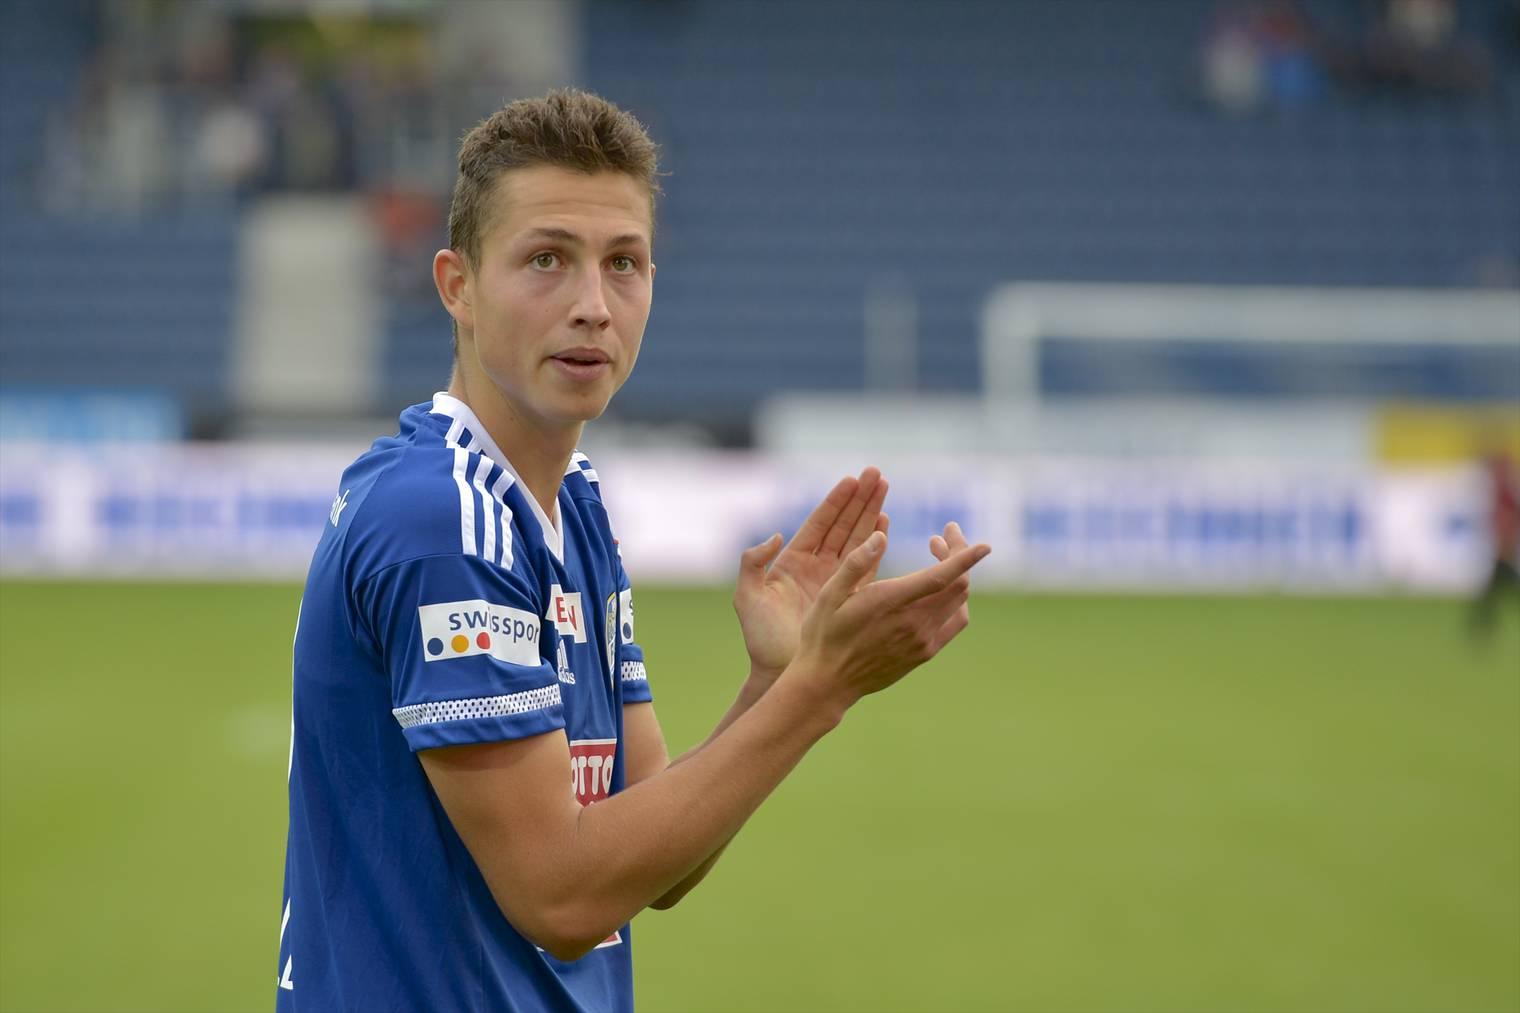 Der 18-jährige FCL-Spieler Remo Arnold